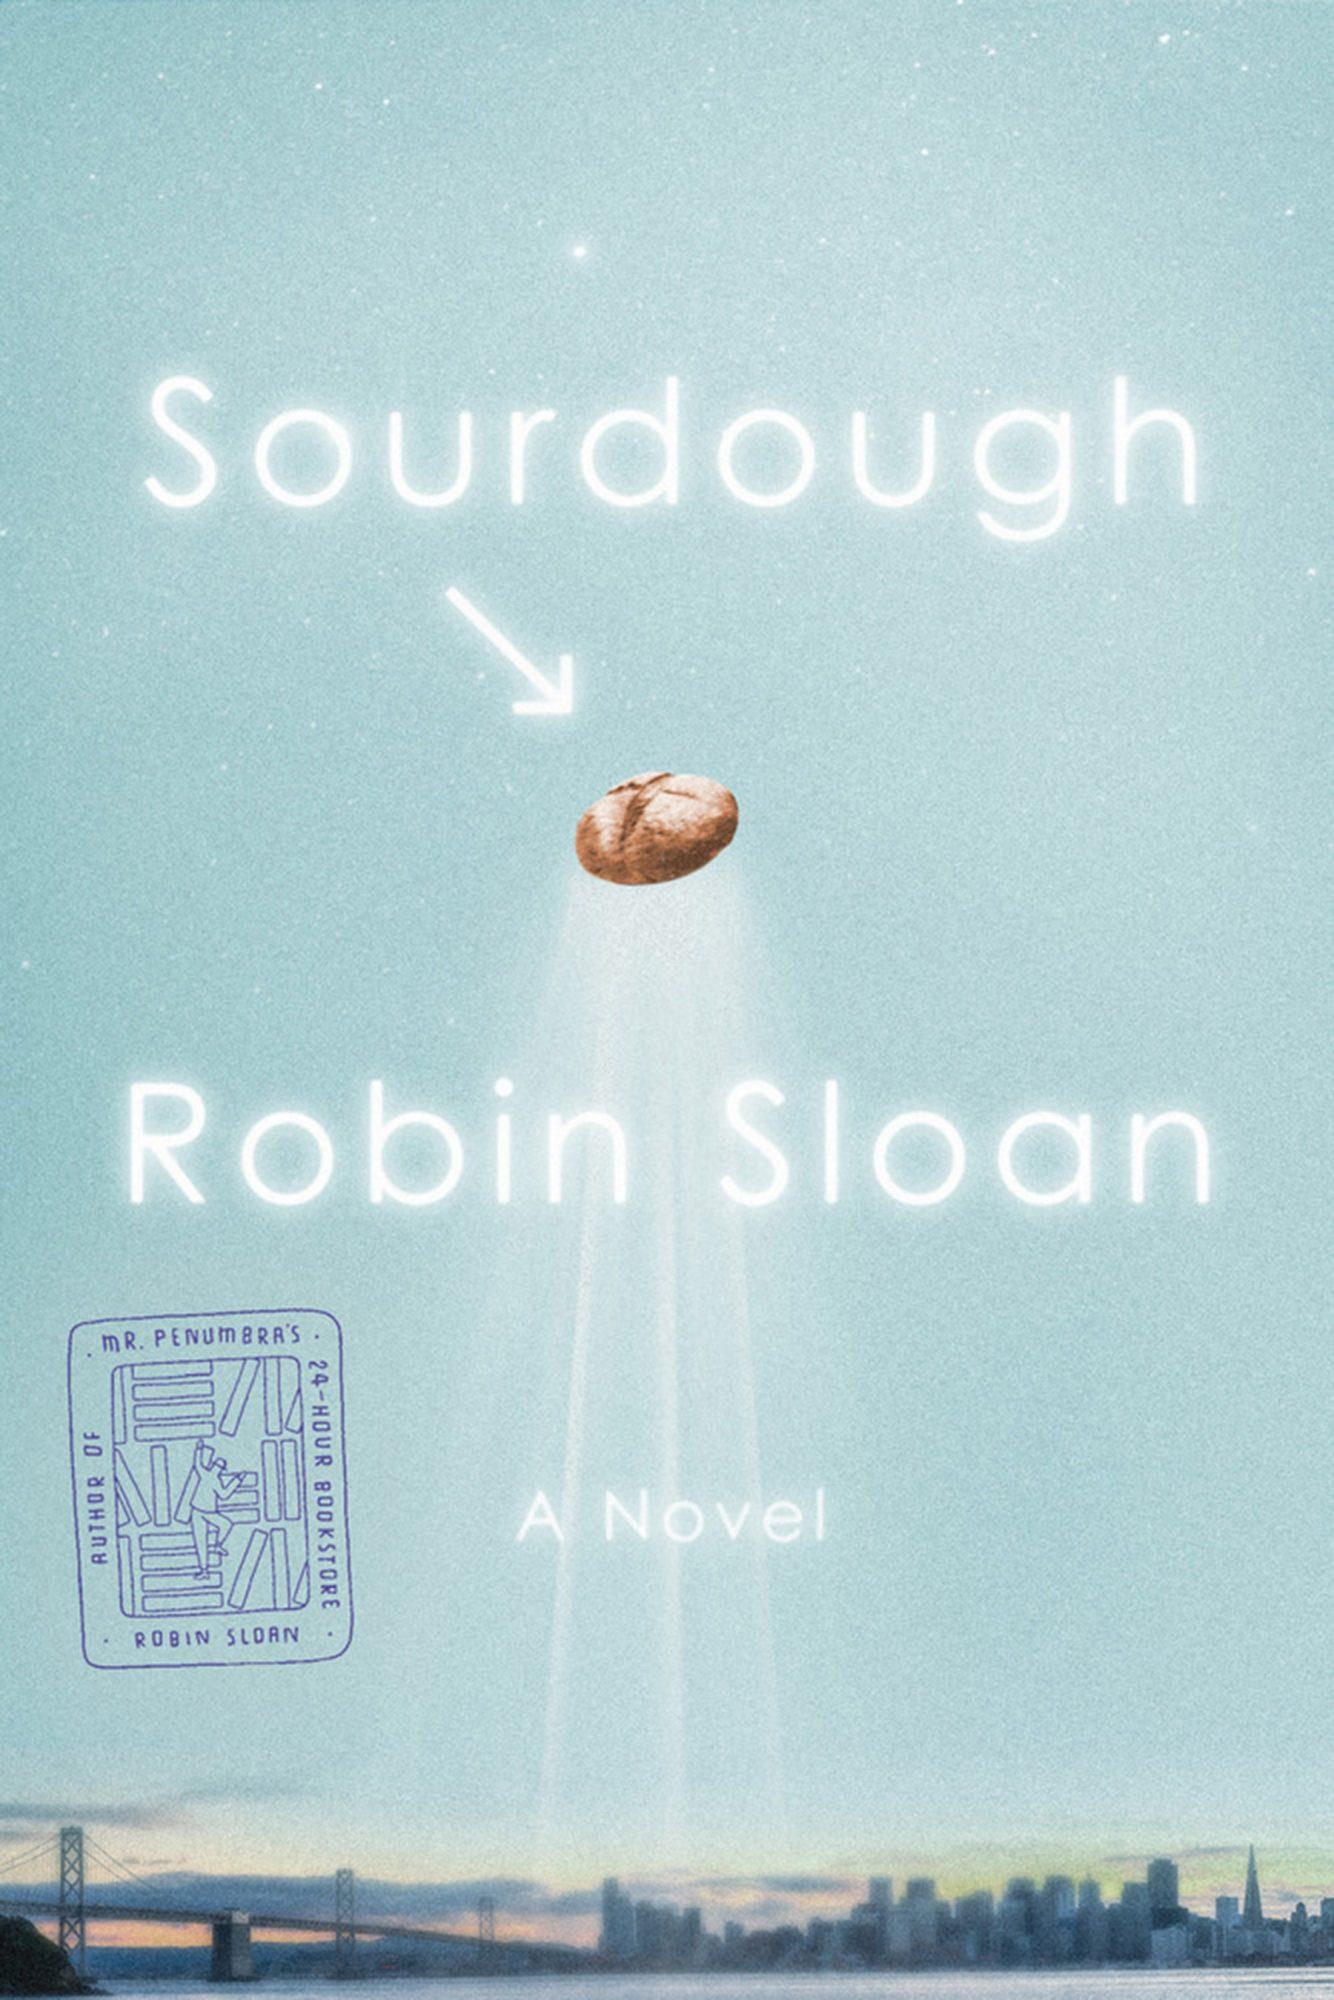 Sourdough: A Novelby Robin Sloan